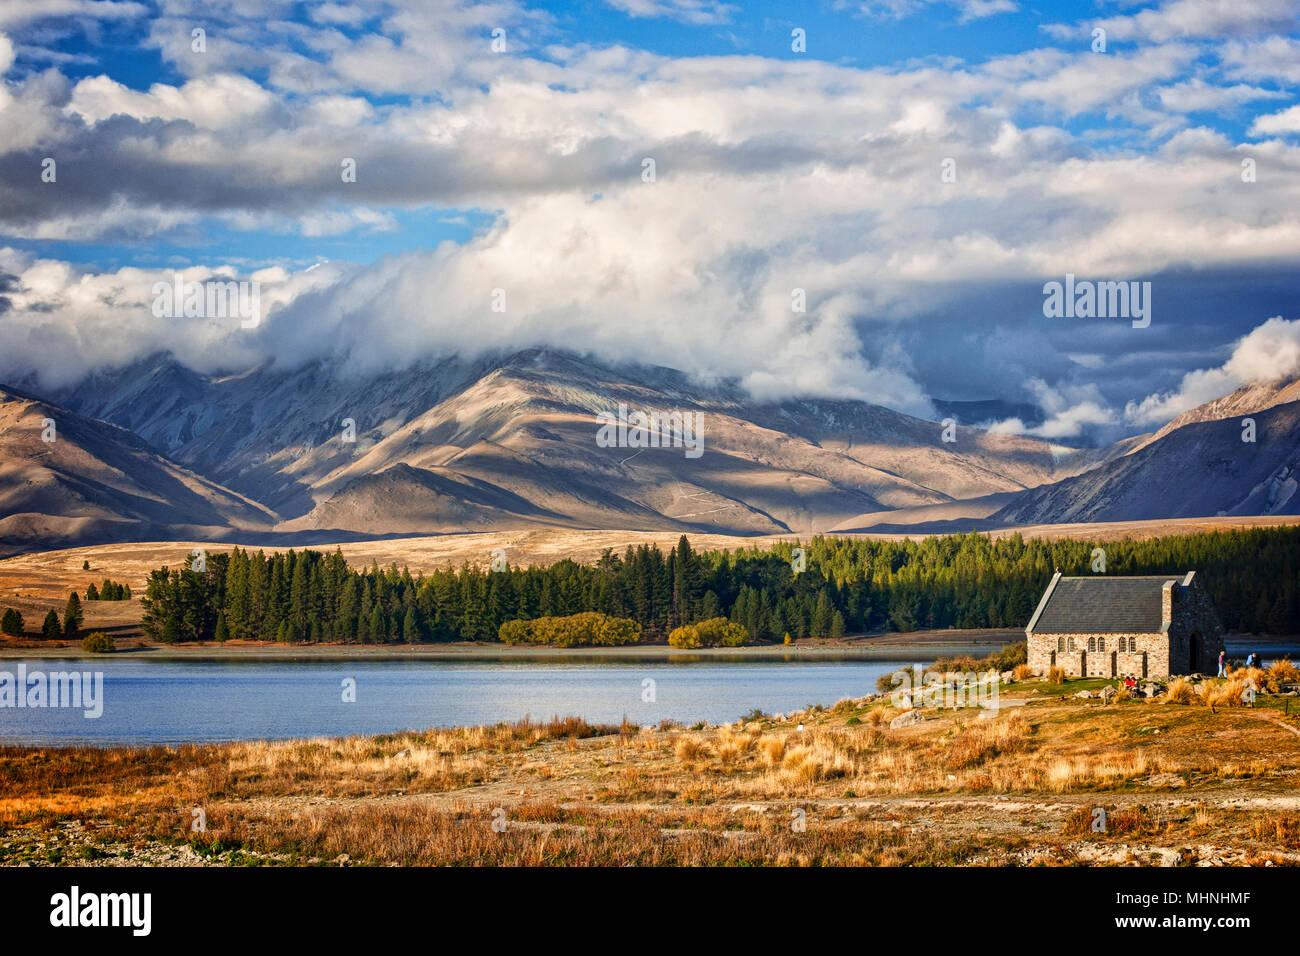 Lake Tekapo and the Church of the Good Shepherd, Canterbury, New Zealand, and the Two Thumb Range. Tekapo is a popular tourist destination. - Stock Image